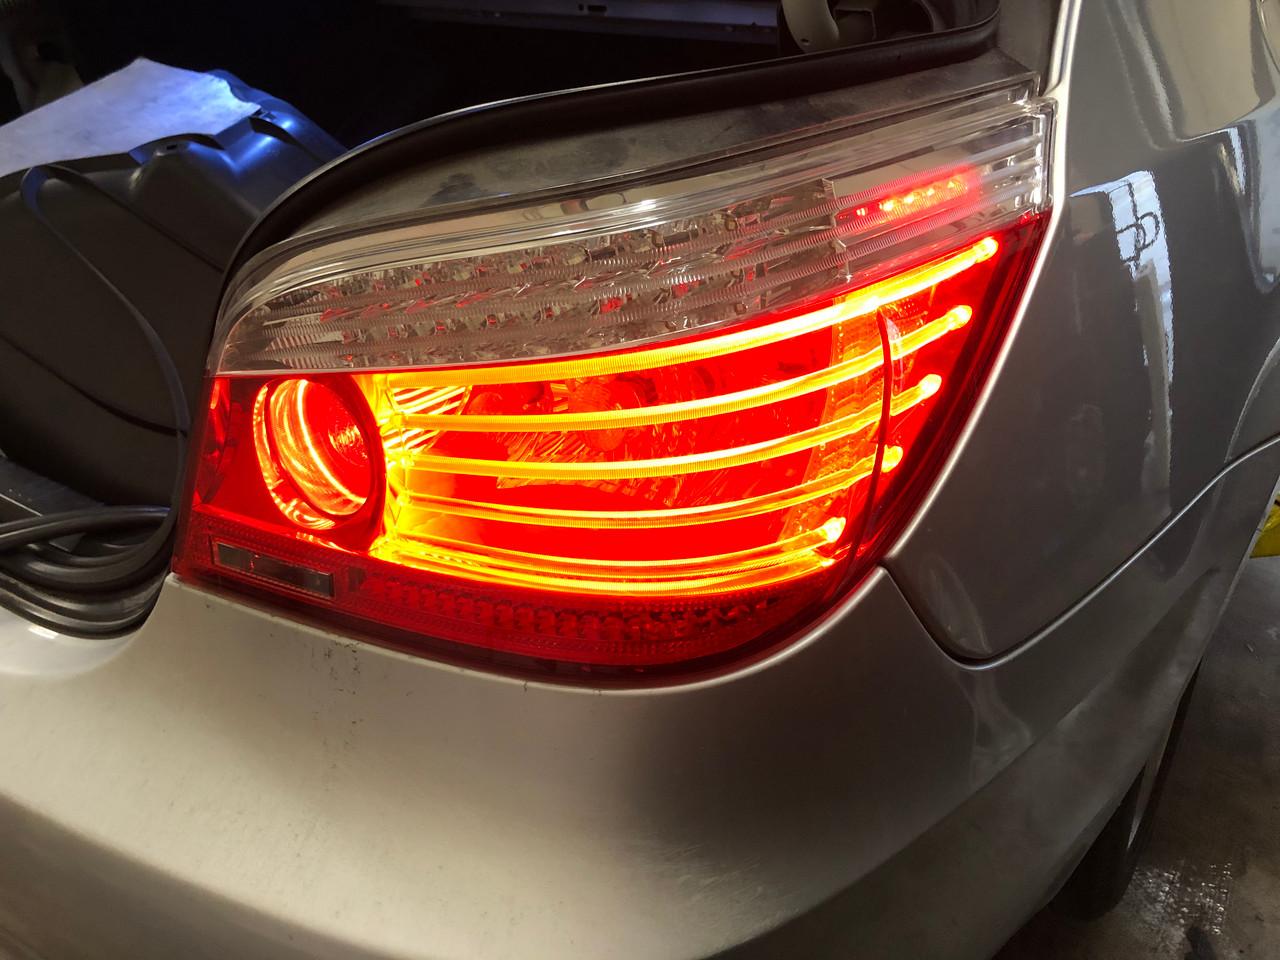 08 09 BMW E60 535i 550i PASSENGER LCI REAR BRAKE LAMP LIGHT OEM 7361594